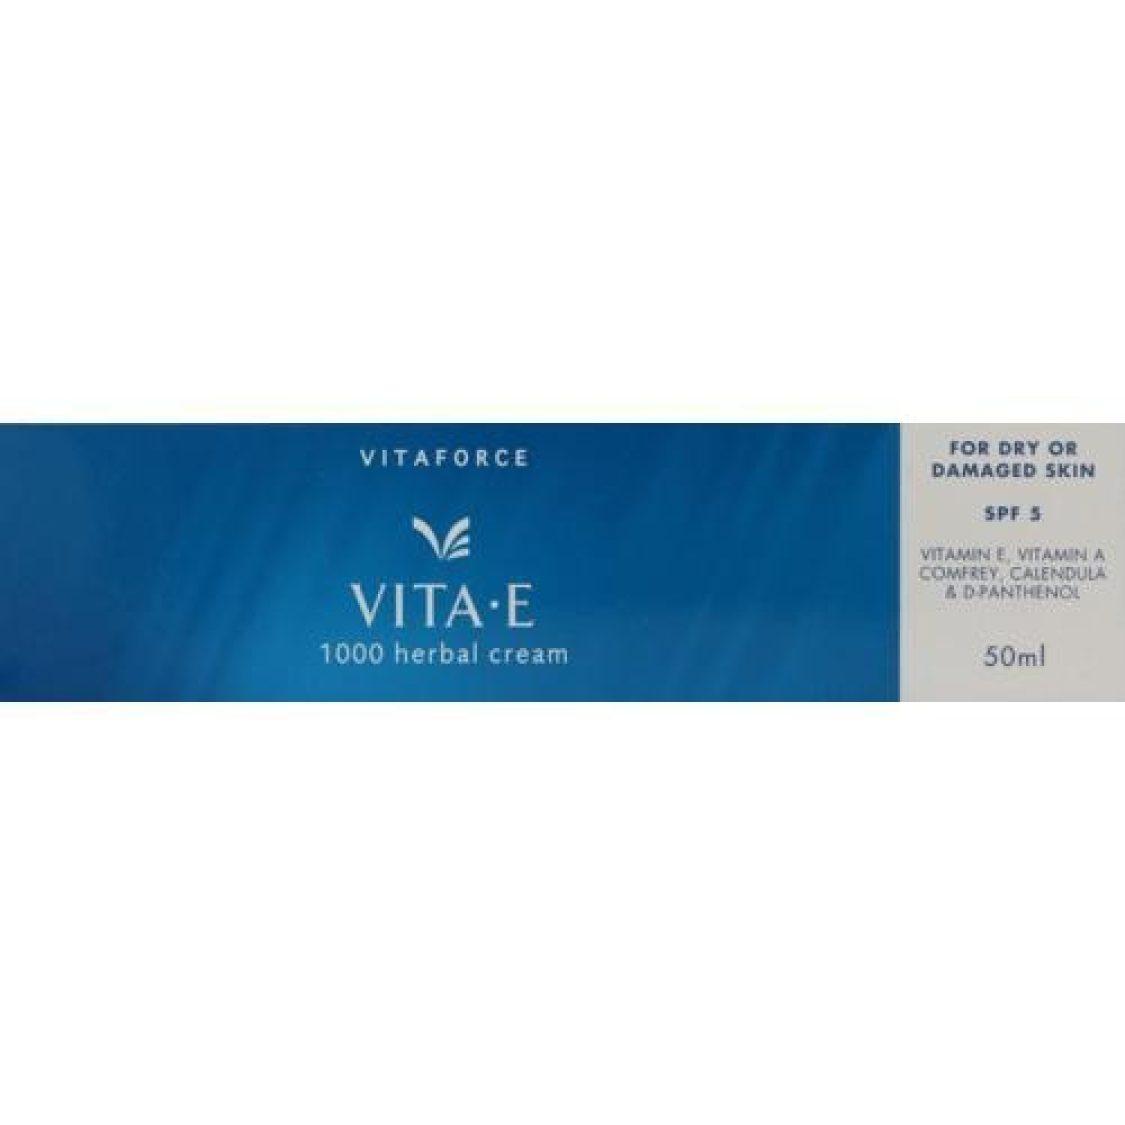 Vitaforce - Vita-E 1000 Herbal Cream 50ml